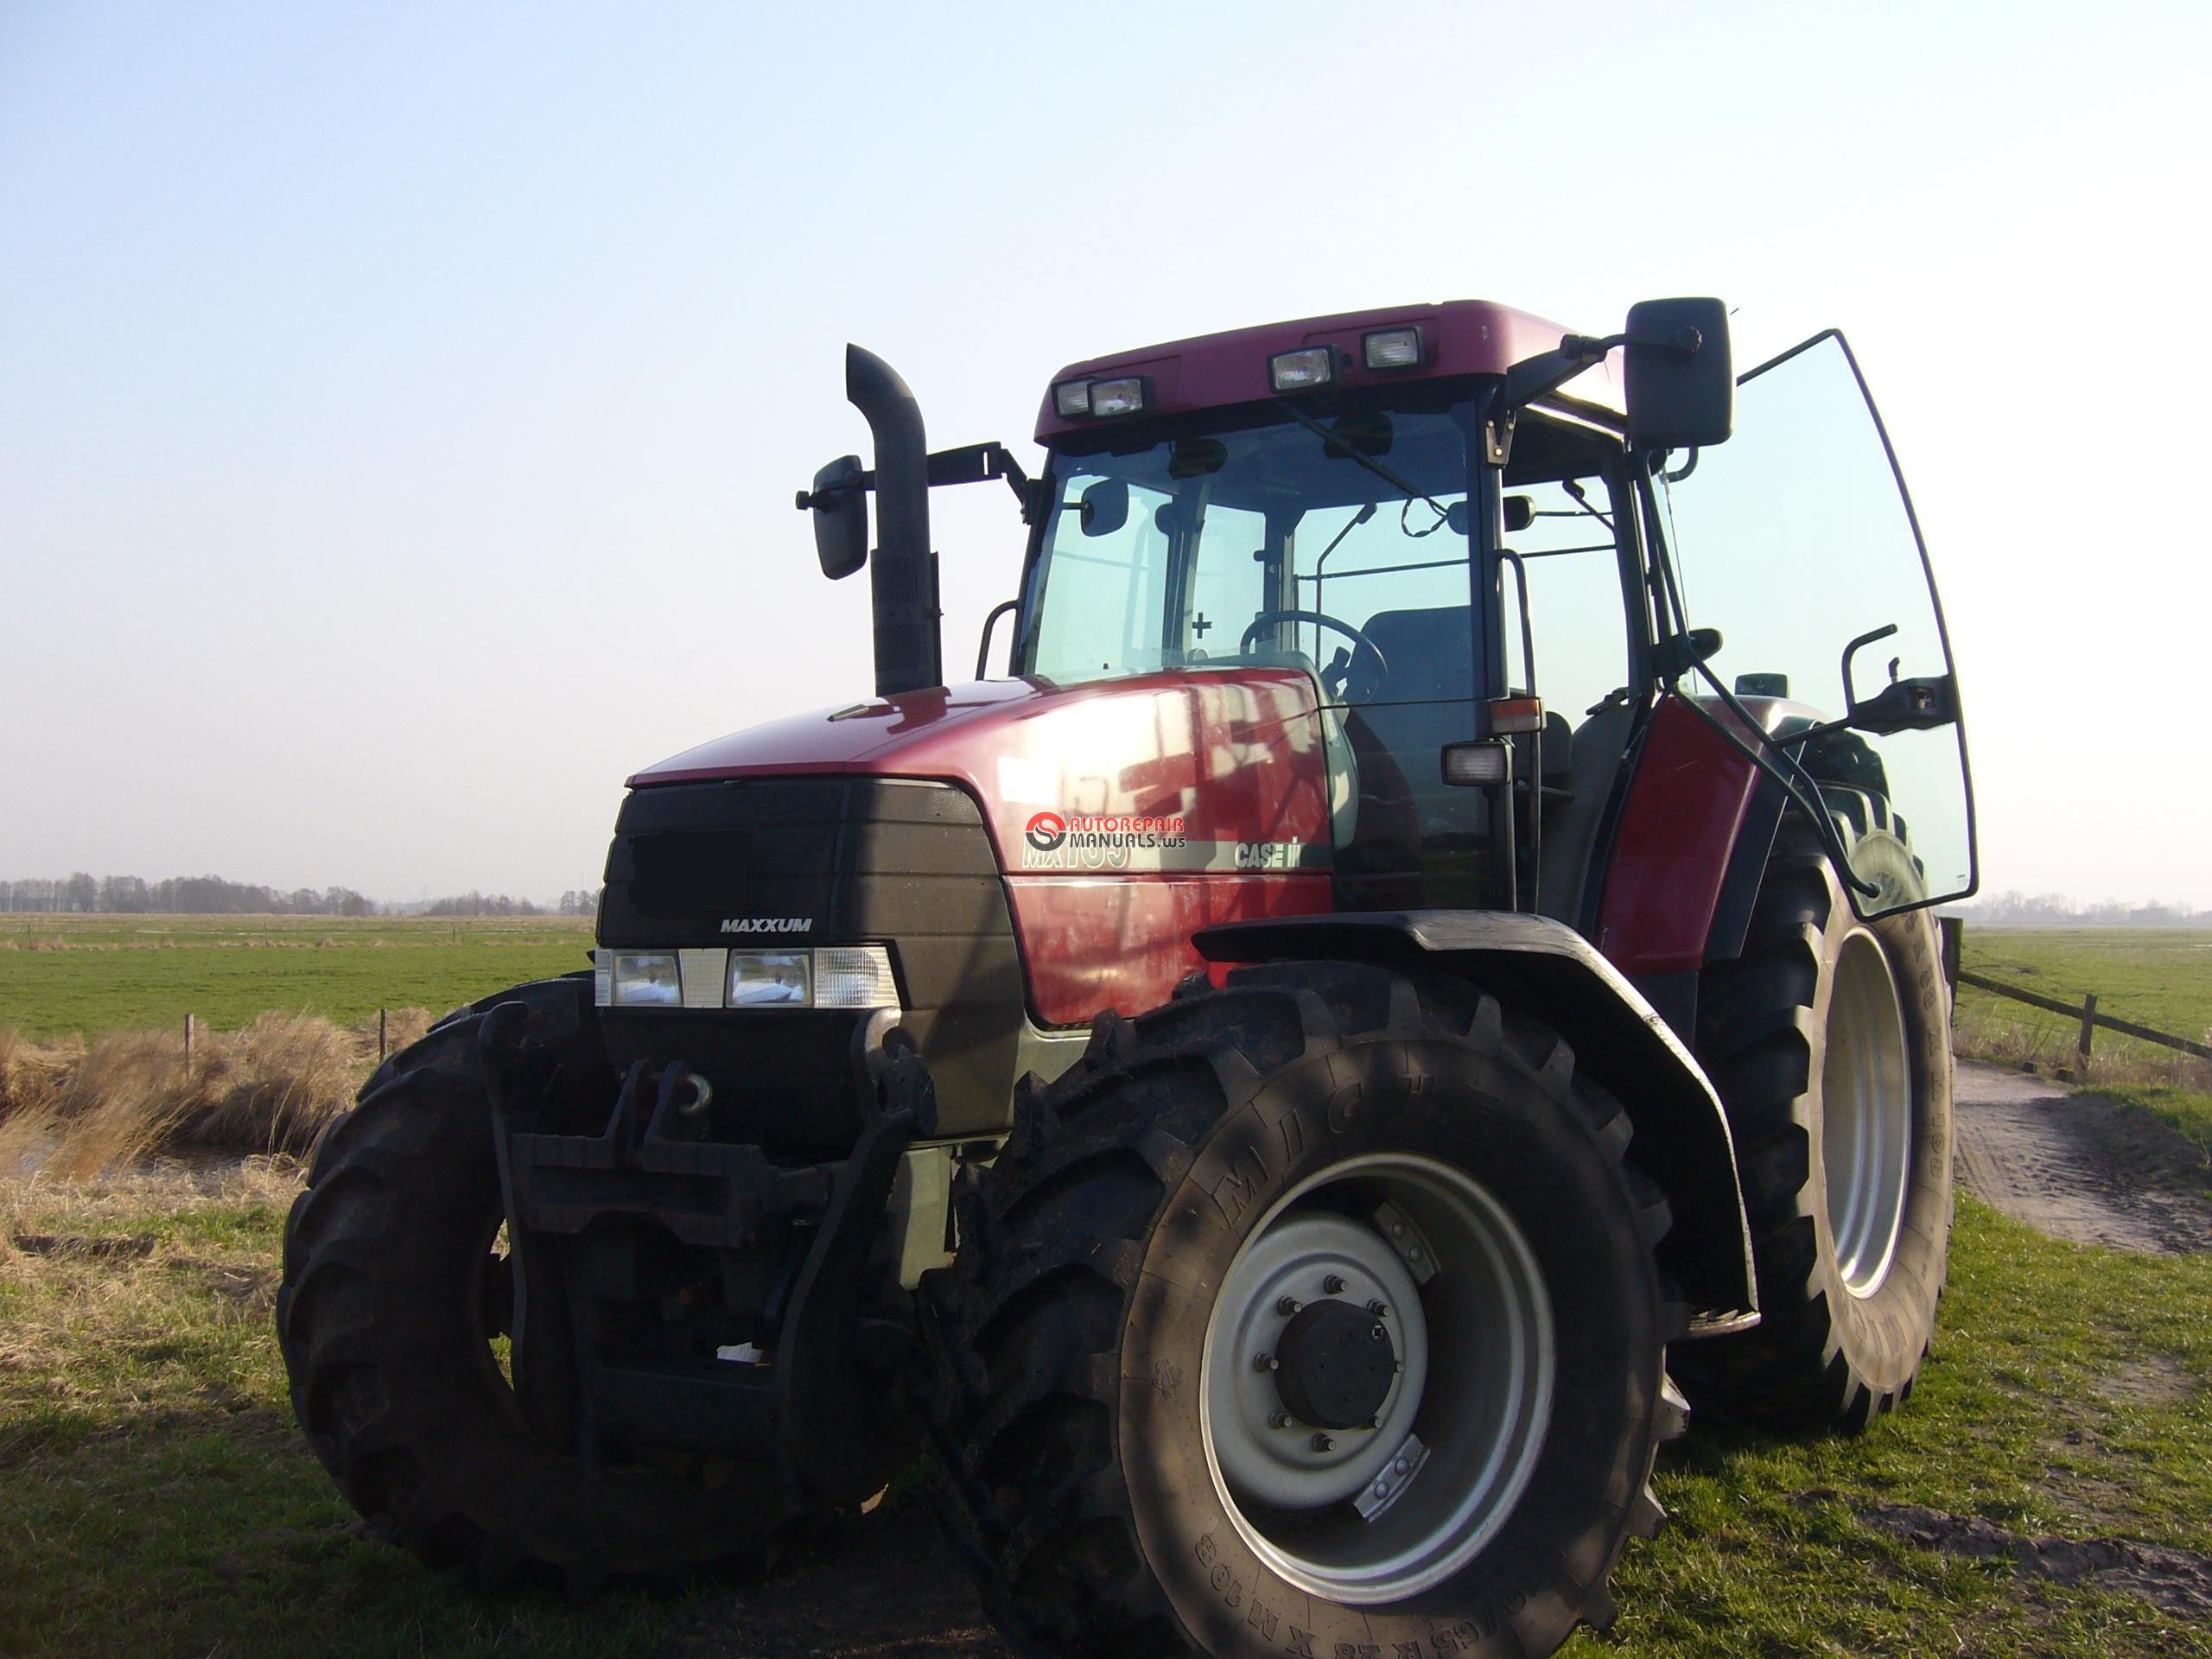 Ac Auto Repair >> Tractors Case Mx100,110,120,135, Full Service Manual 1606 pags.   Auto Repair Manual Forum ...